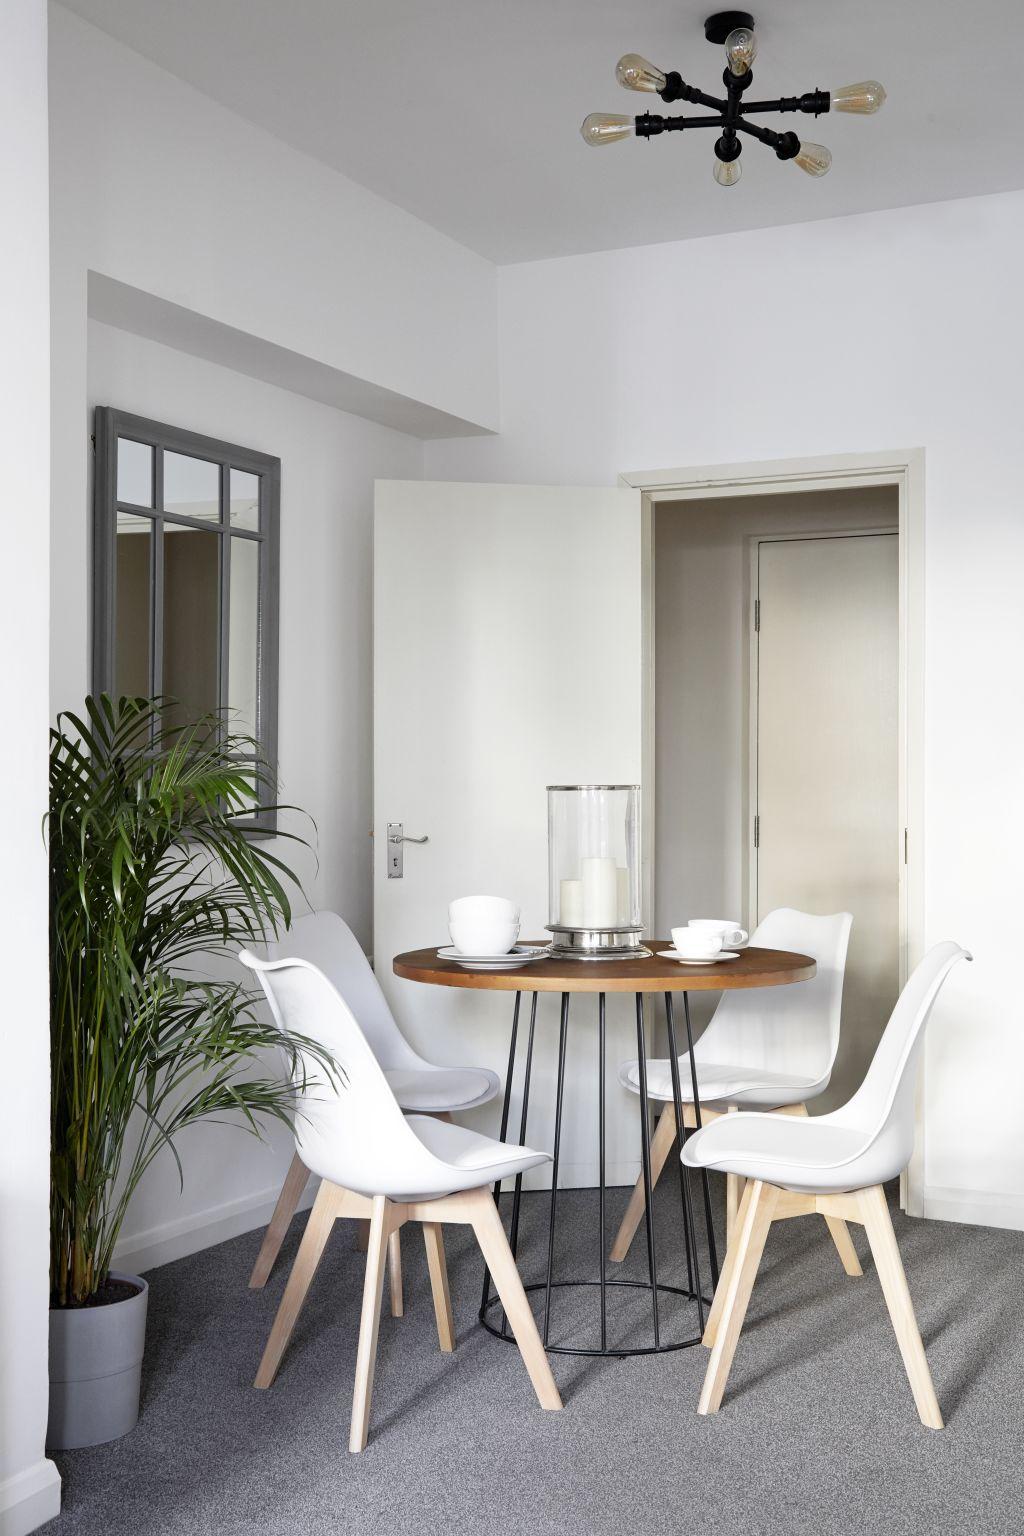 image 7 furnished 1 bedroom Apartment for rent in Watford, Hertfordshire